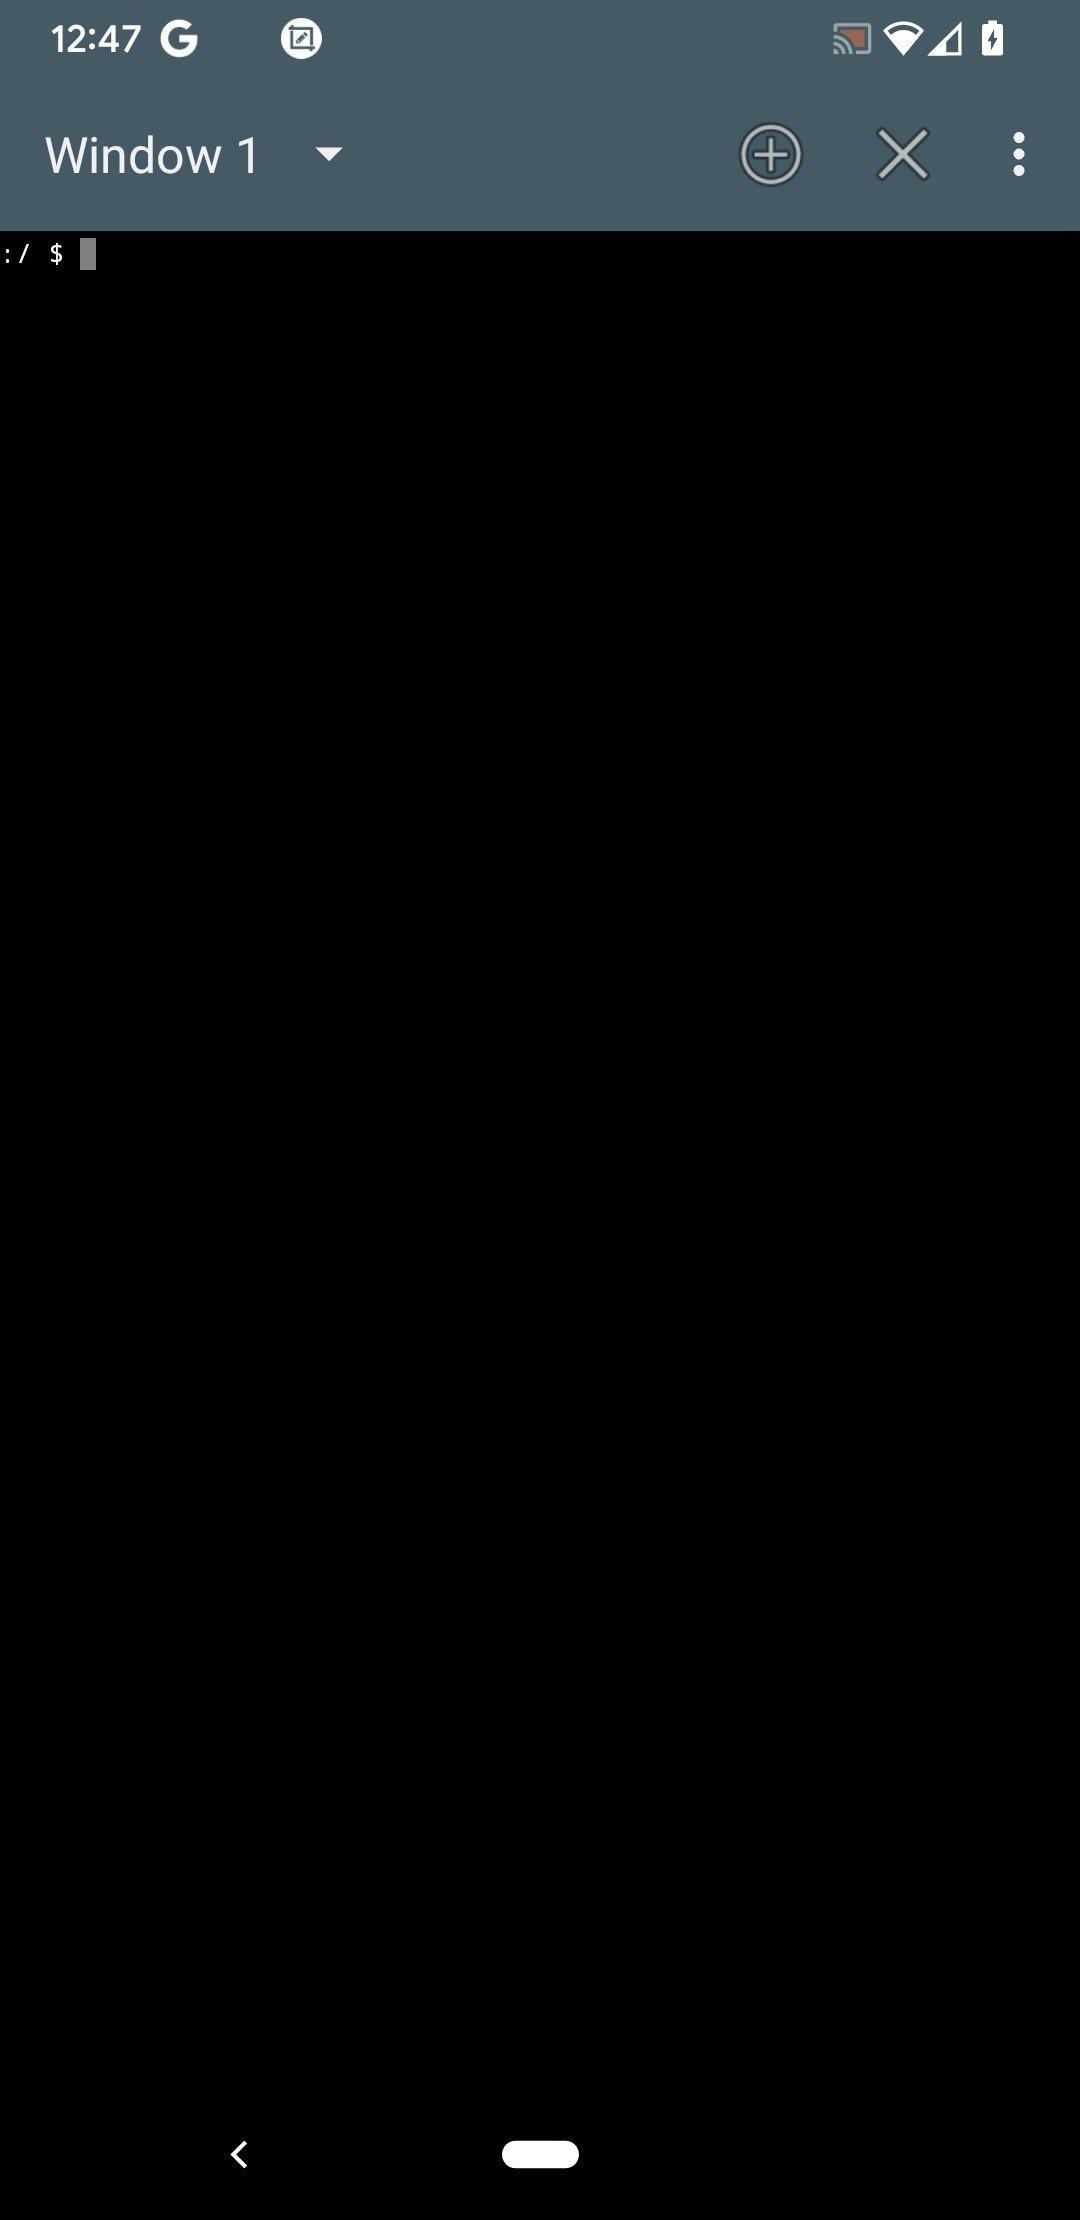 Android Terminal Emulator 1 0 70 - Download APK Free